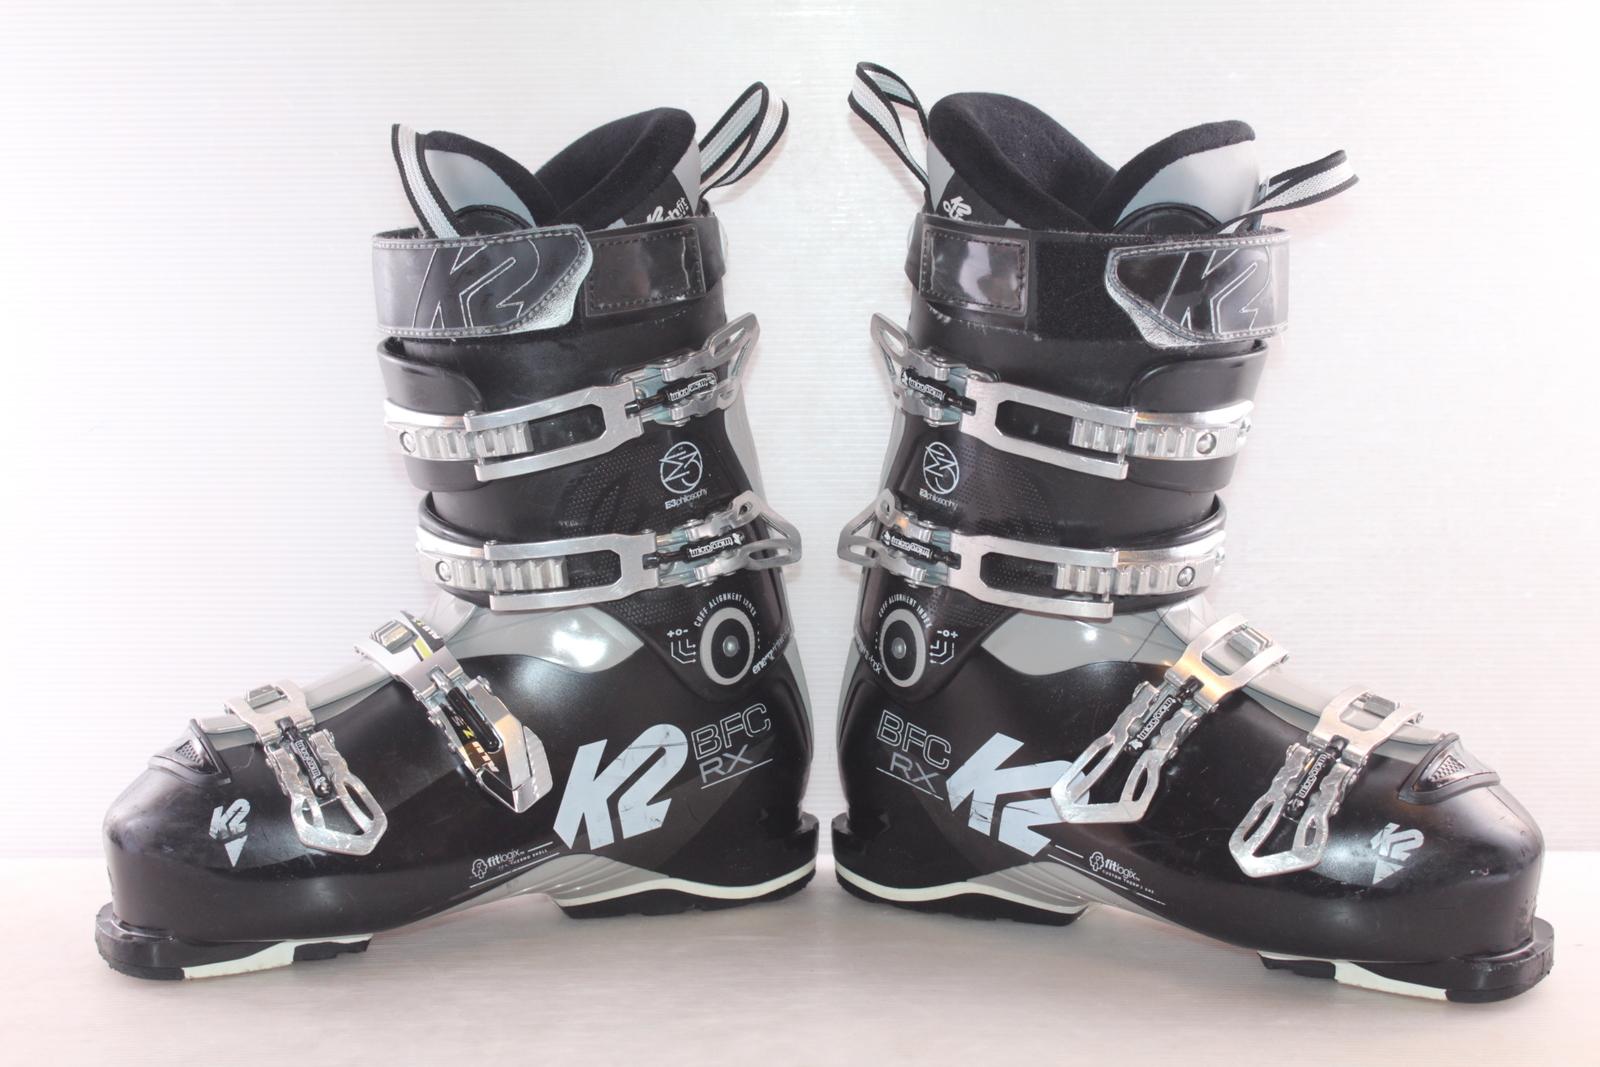 Lyžařské boty K2 BFC RX vel. EU42.5 flexe 90